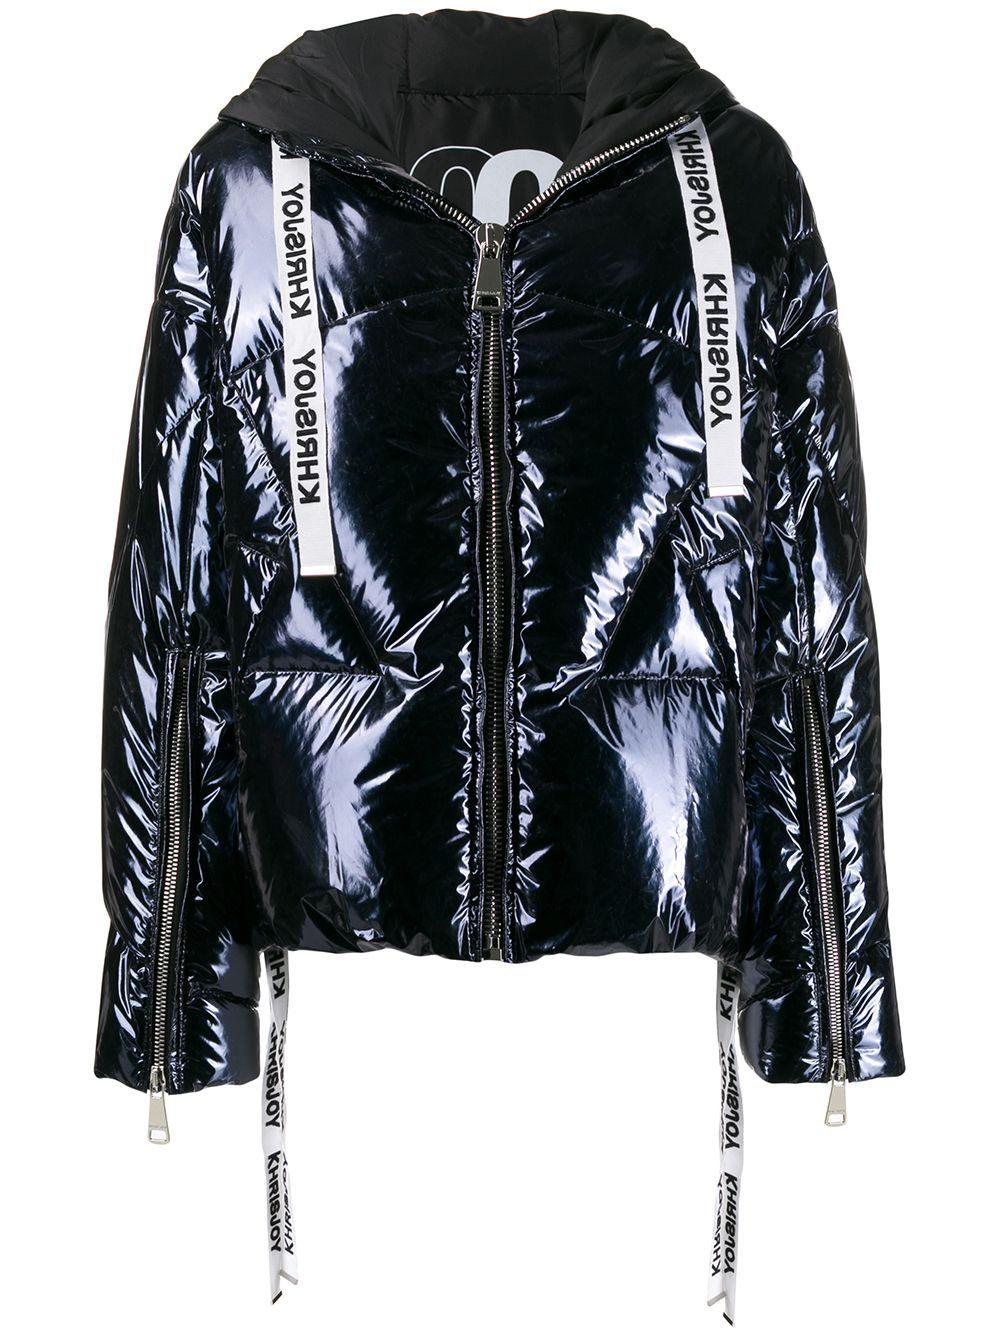 Khrisjoy Metallic Puffer Jacket Farfetch In 2020 Black Girl Fashion Chinese Fashion Street Black Puffer Jacket [ 1334 x 1000 Pixel ]